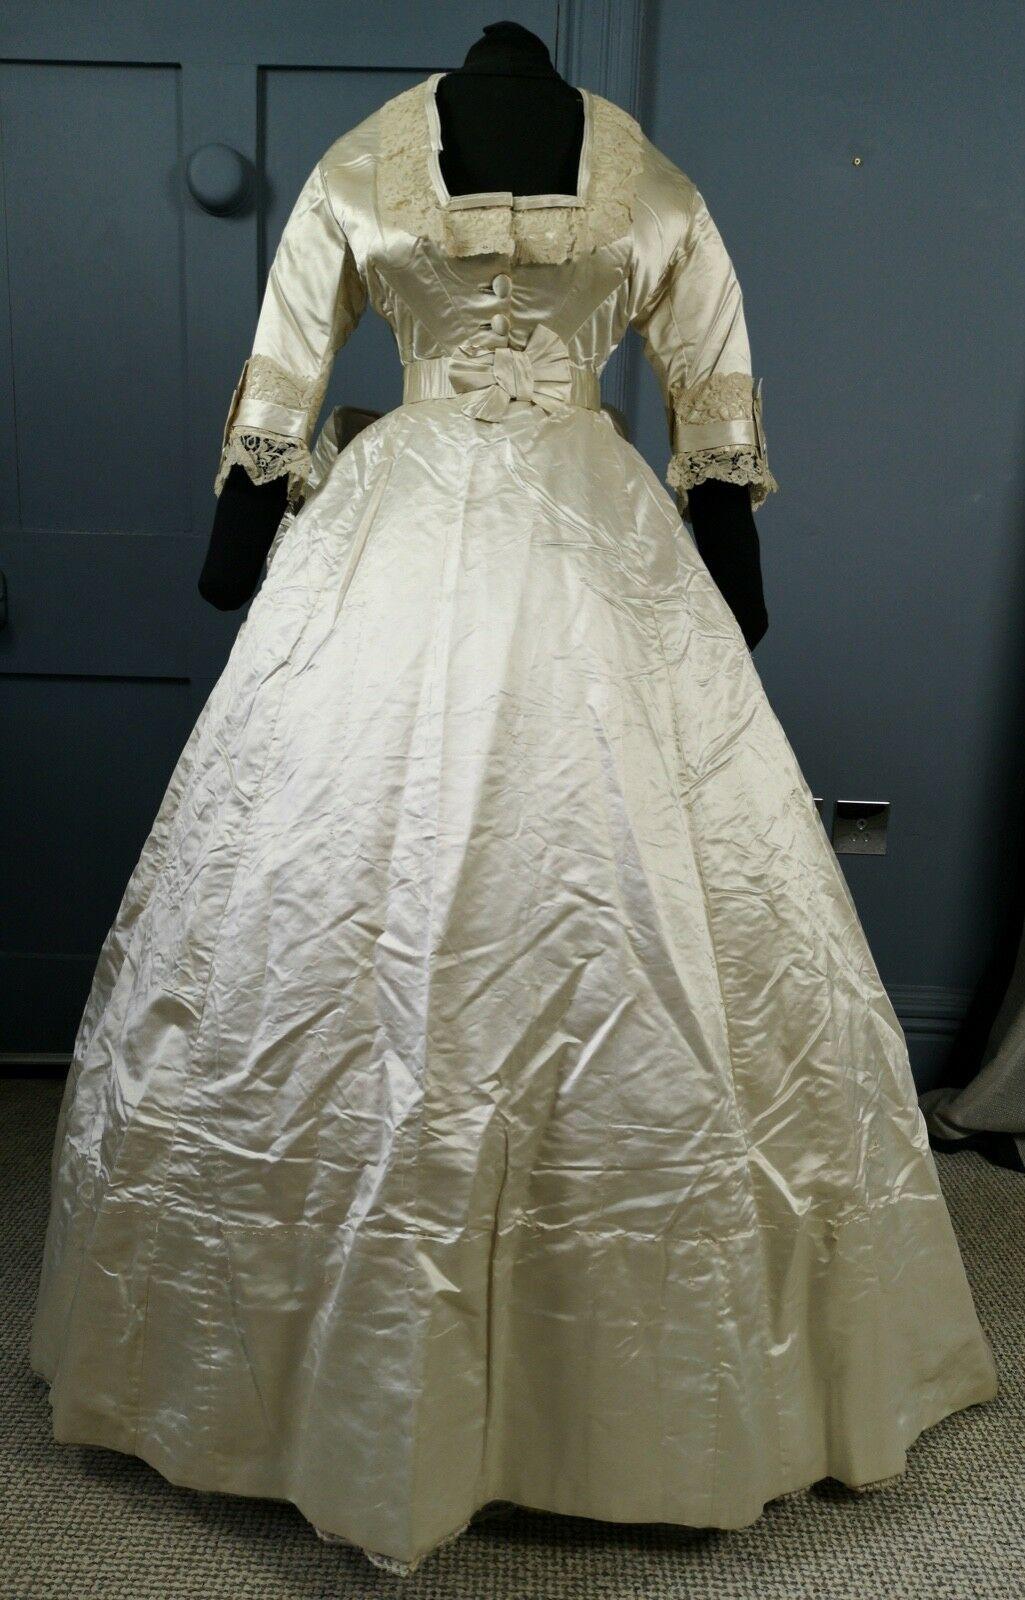 Magnificent Victorian 1860s / 1870s Bustle Wedding Dress